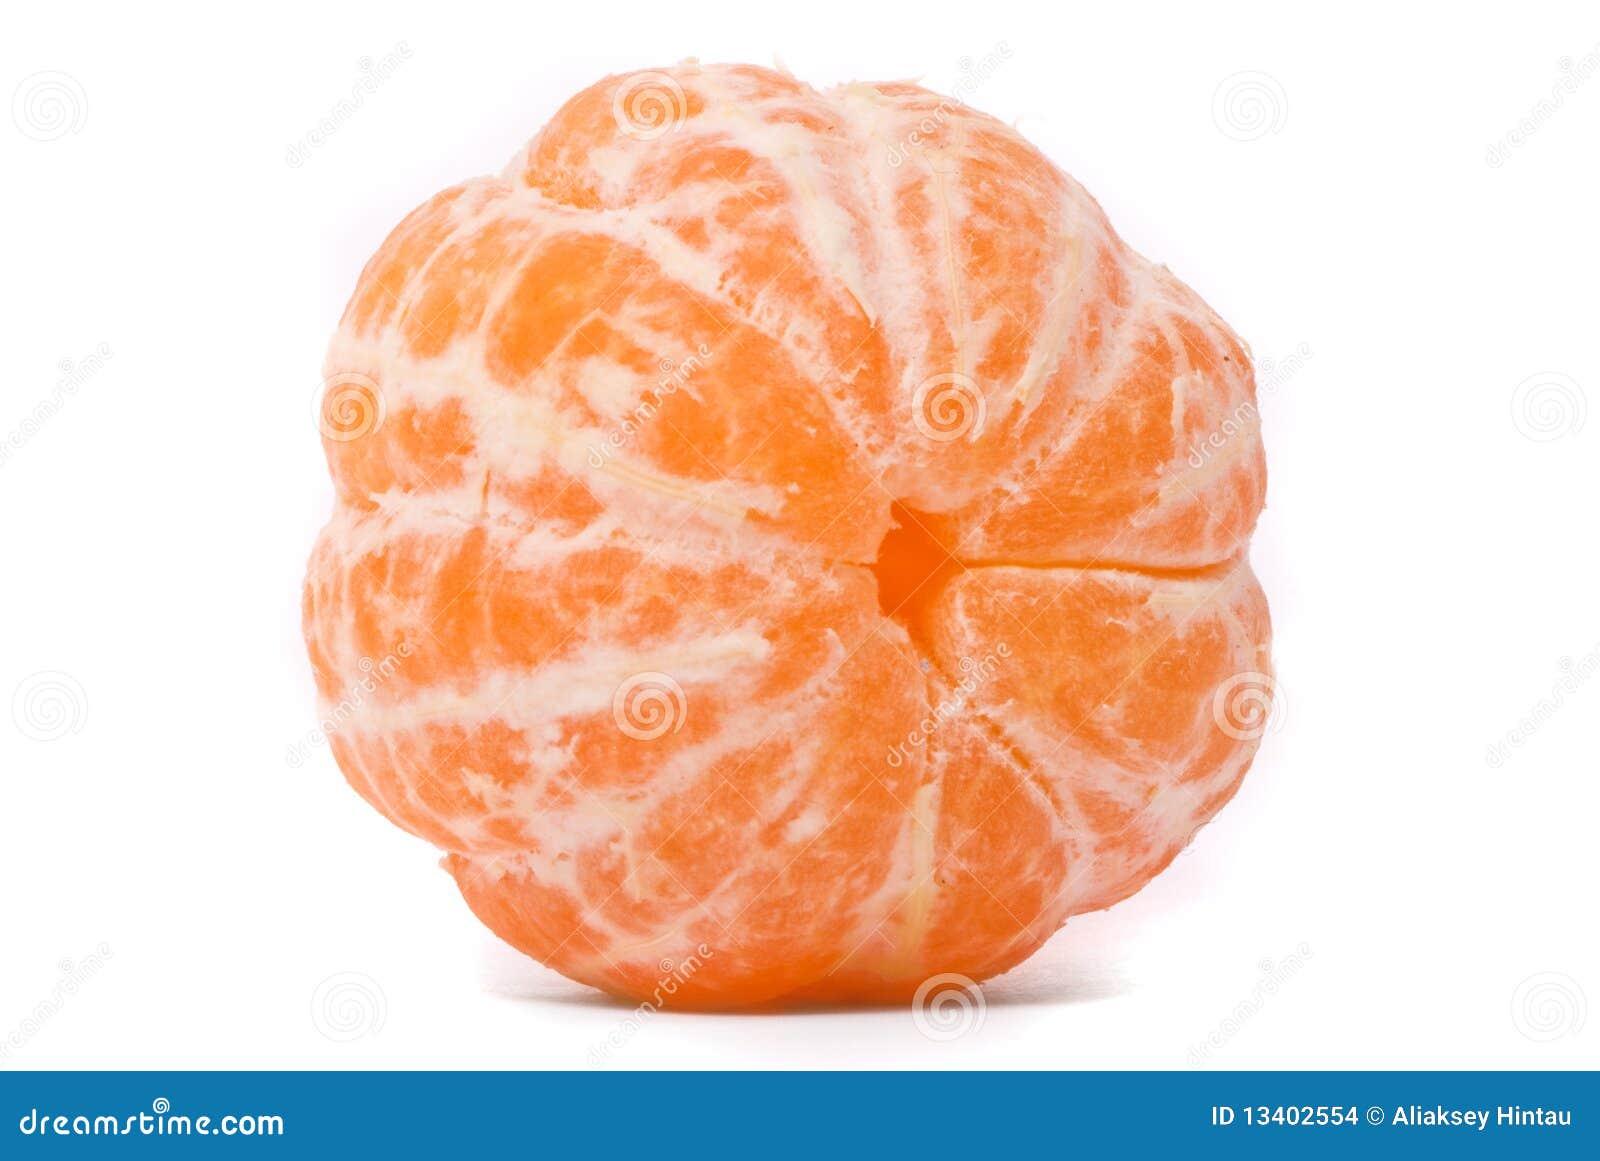 mandarine juteuse photo stock image du manger citron 13402554. Black Bedroom Furniture Sets. Home Design Ideas